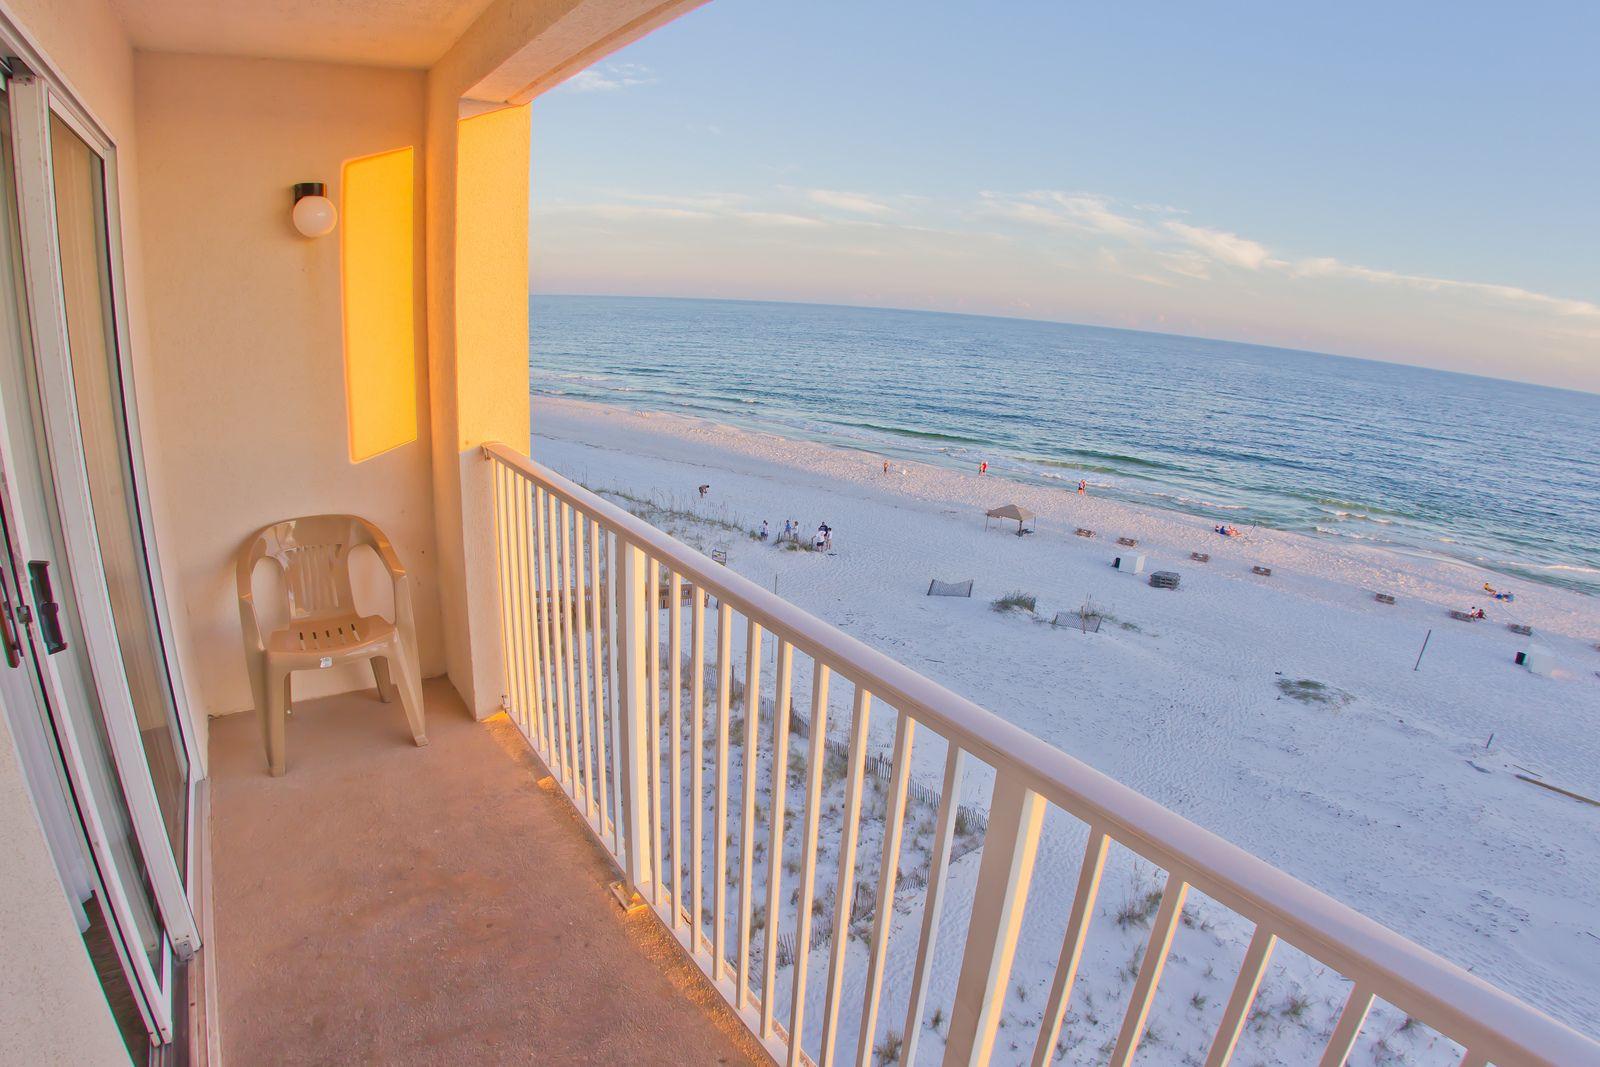 Hilton Garden Inn Beachfront Hotel In Orangebeach Al Hilton Garden Inn Pinterest Orange